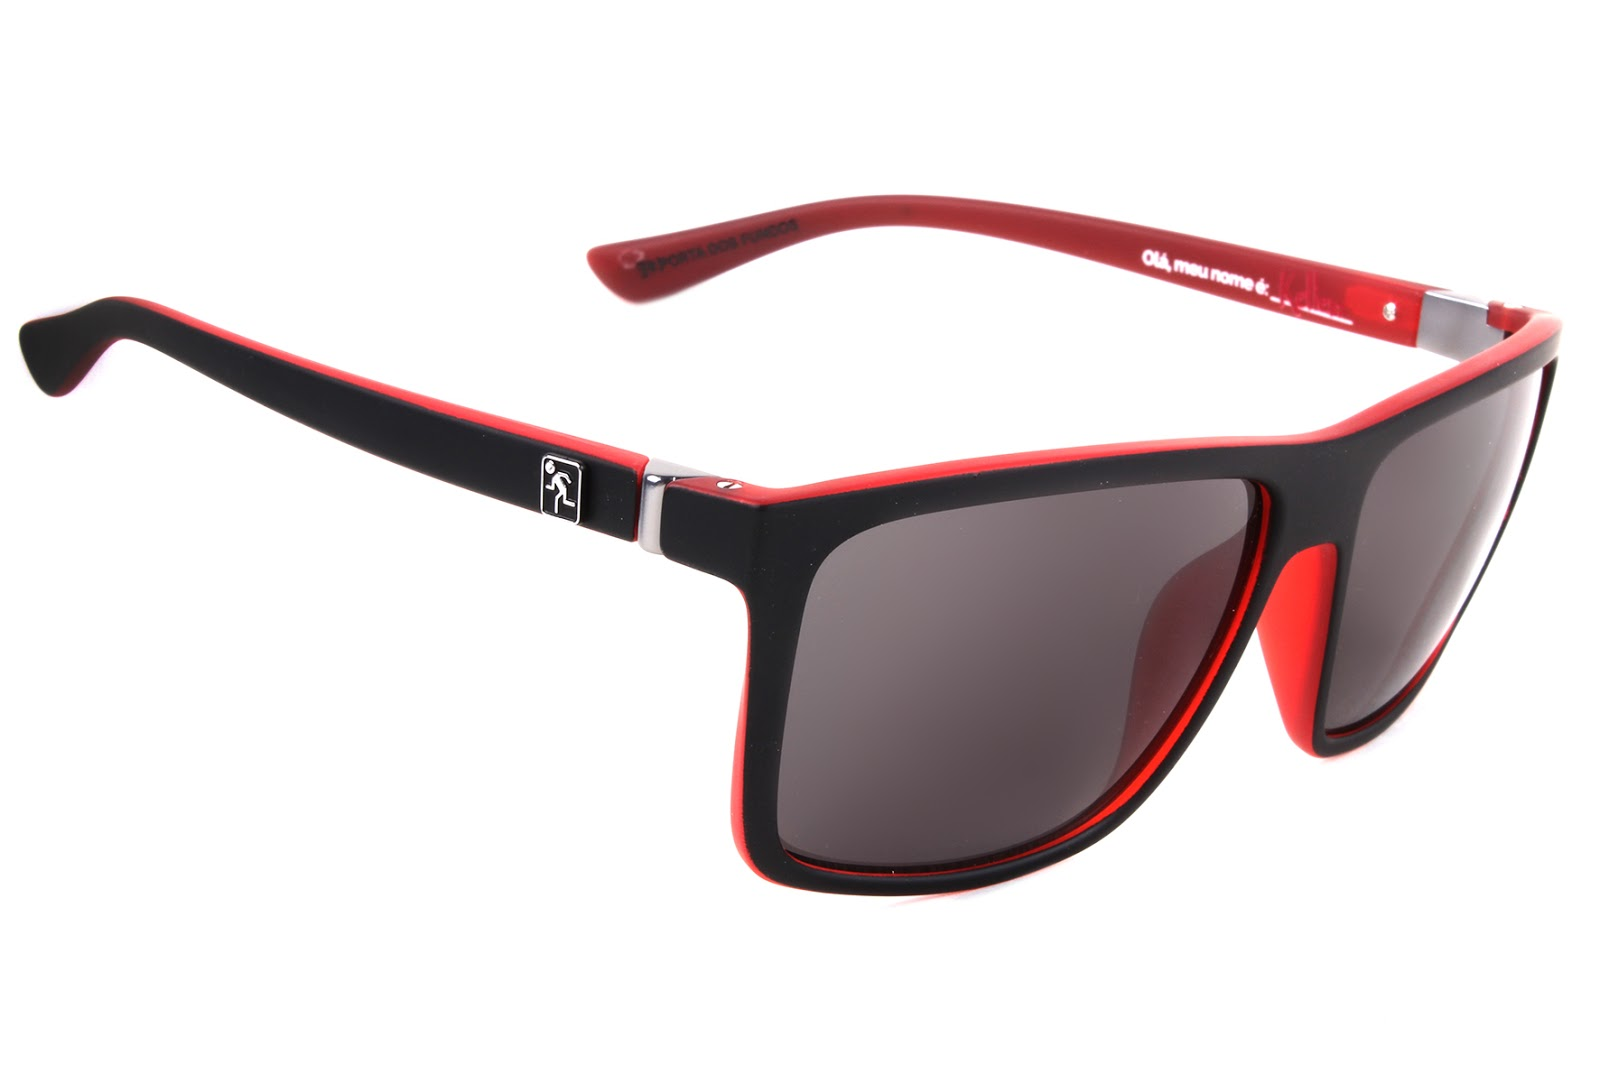 c483043a1 Oculos Masculino De Sol Chilli Beans